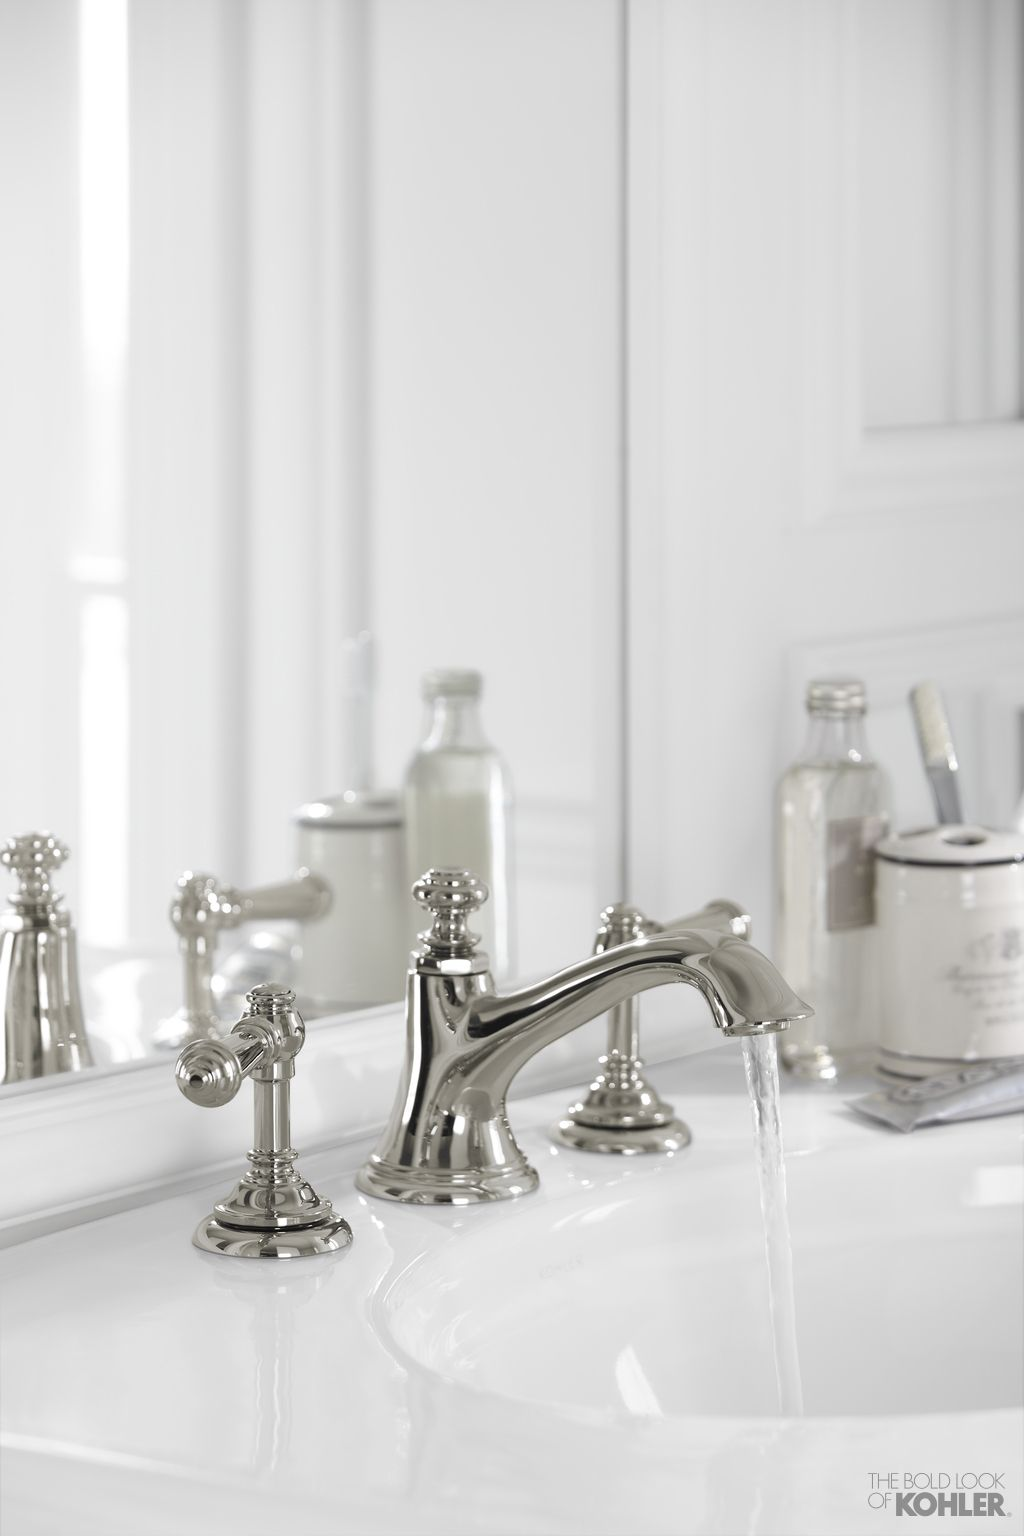 Home Kohler Bathroom Faucet Bathroom Faucets Amazing Bathrooms [ 1536 x 1024 Pixel ]